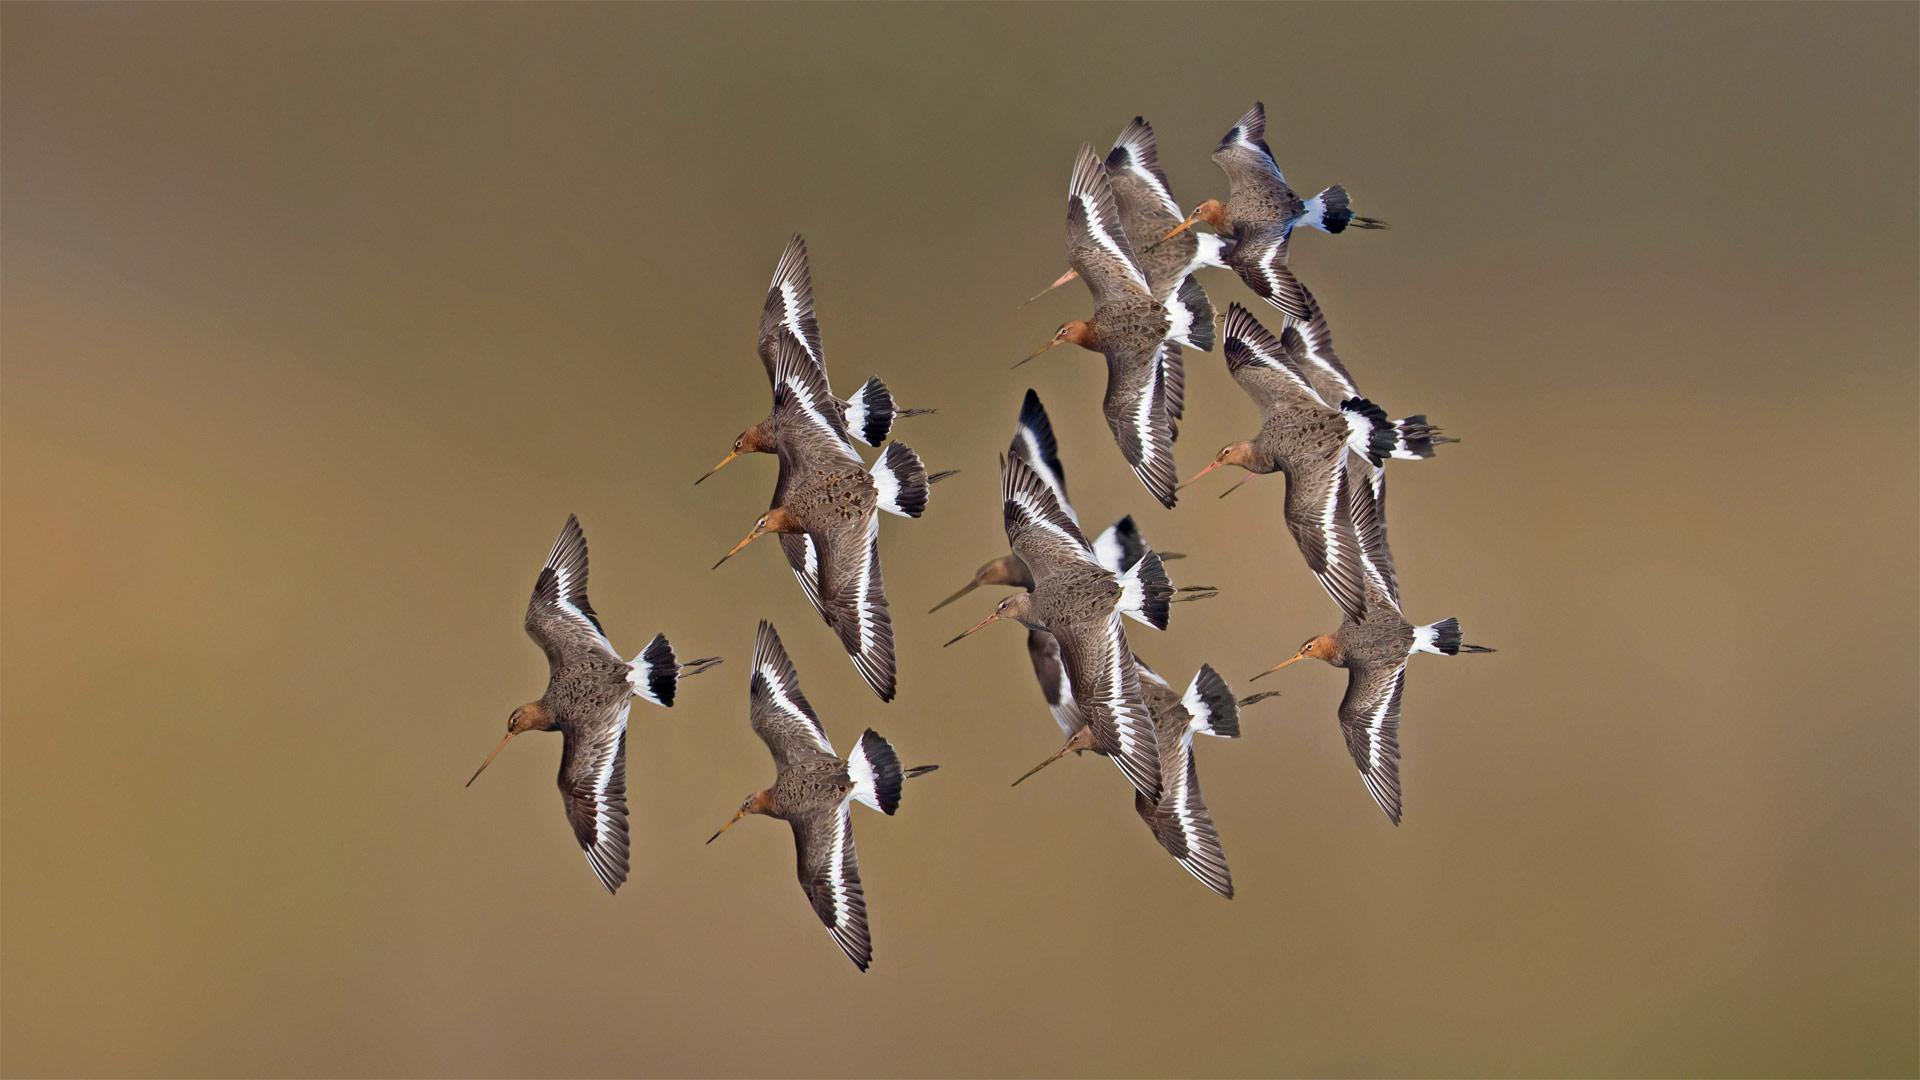 Black-tailed godwits, Netherlands (© Edward van Altena/Minden Pictures)(Bing United States)